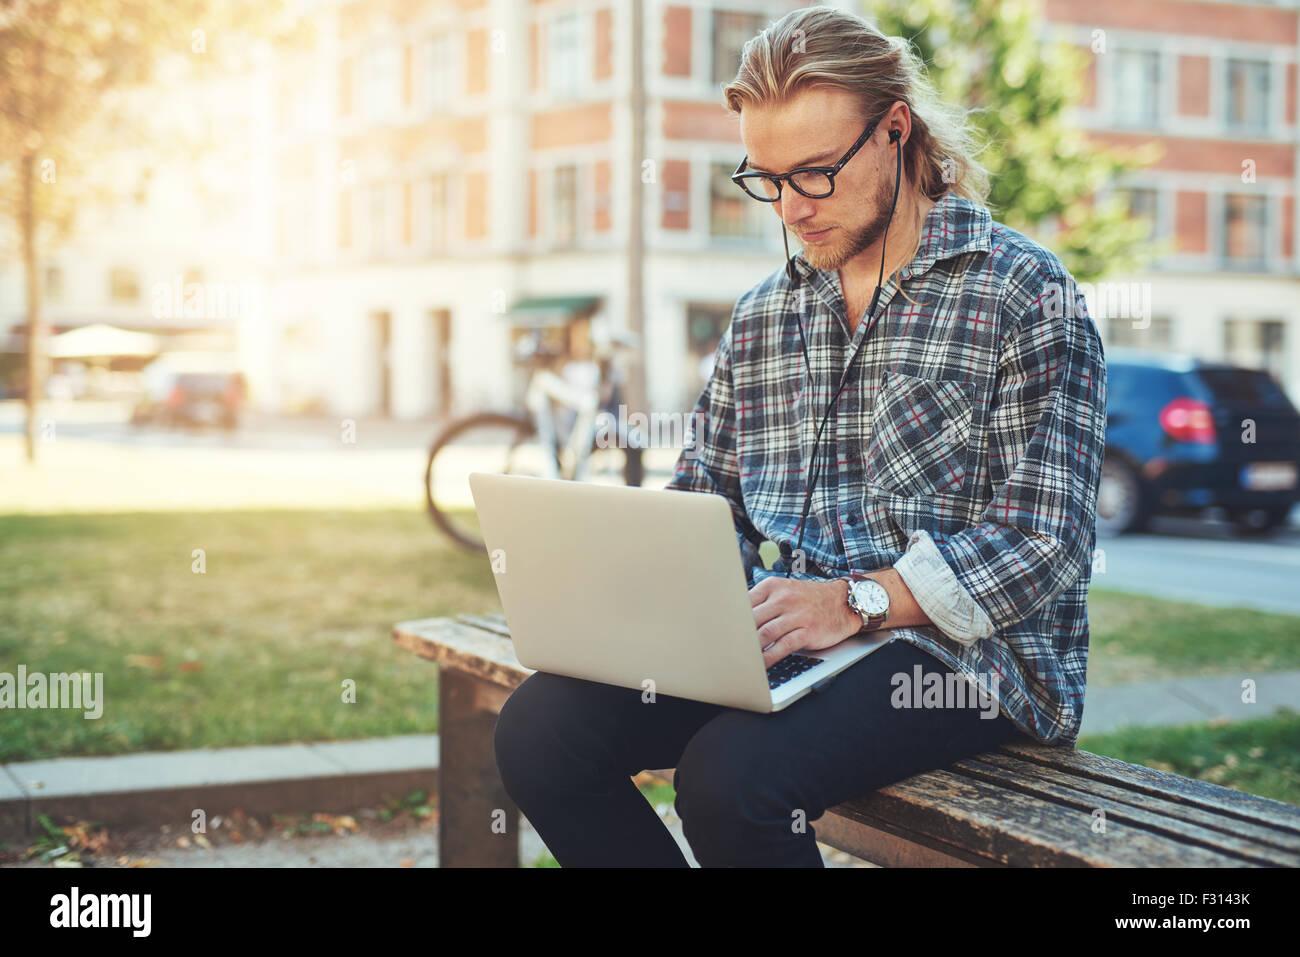 Entrepreneur working on idea on his laptop. city lifestyle - Stock Image